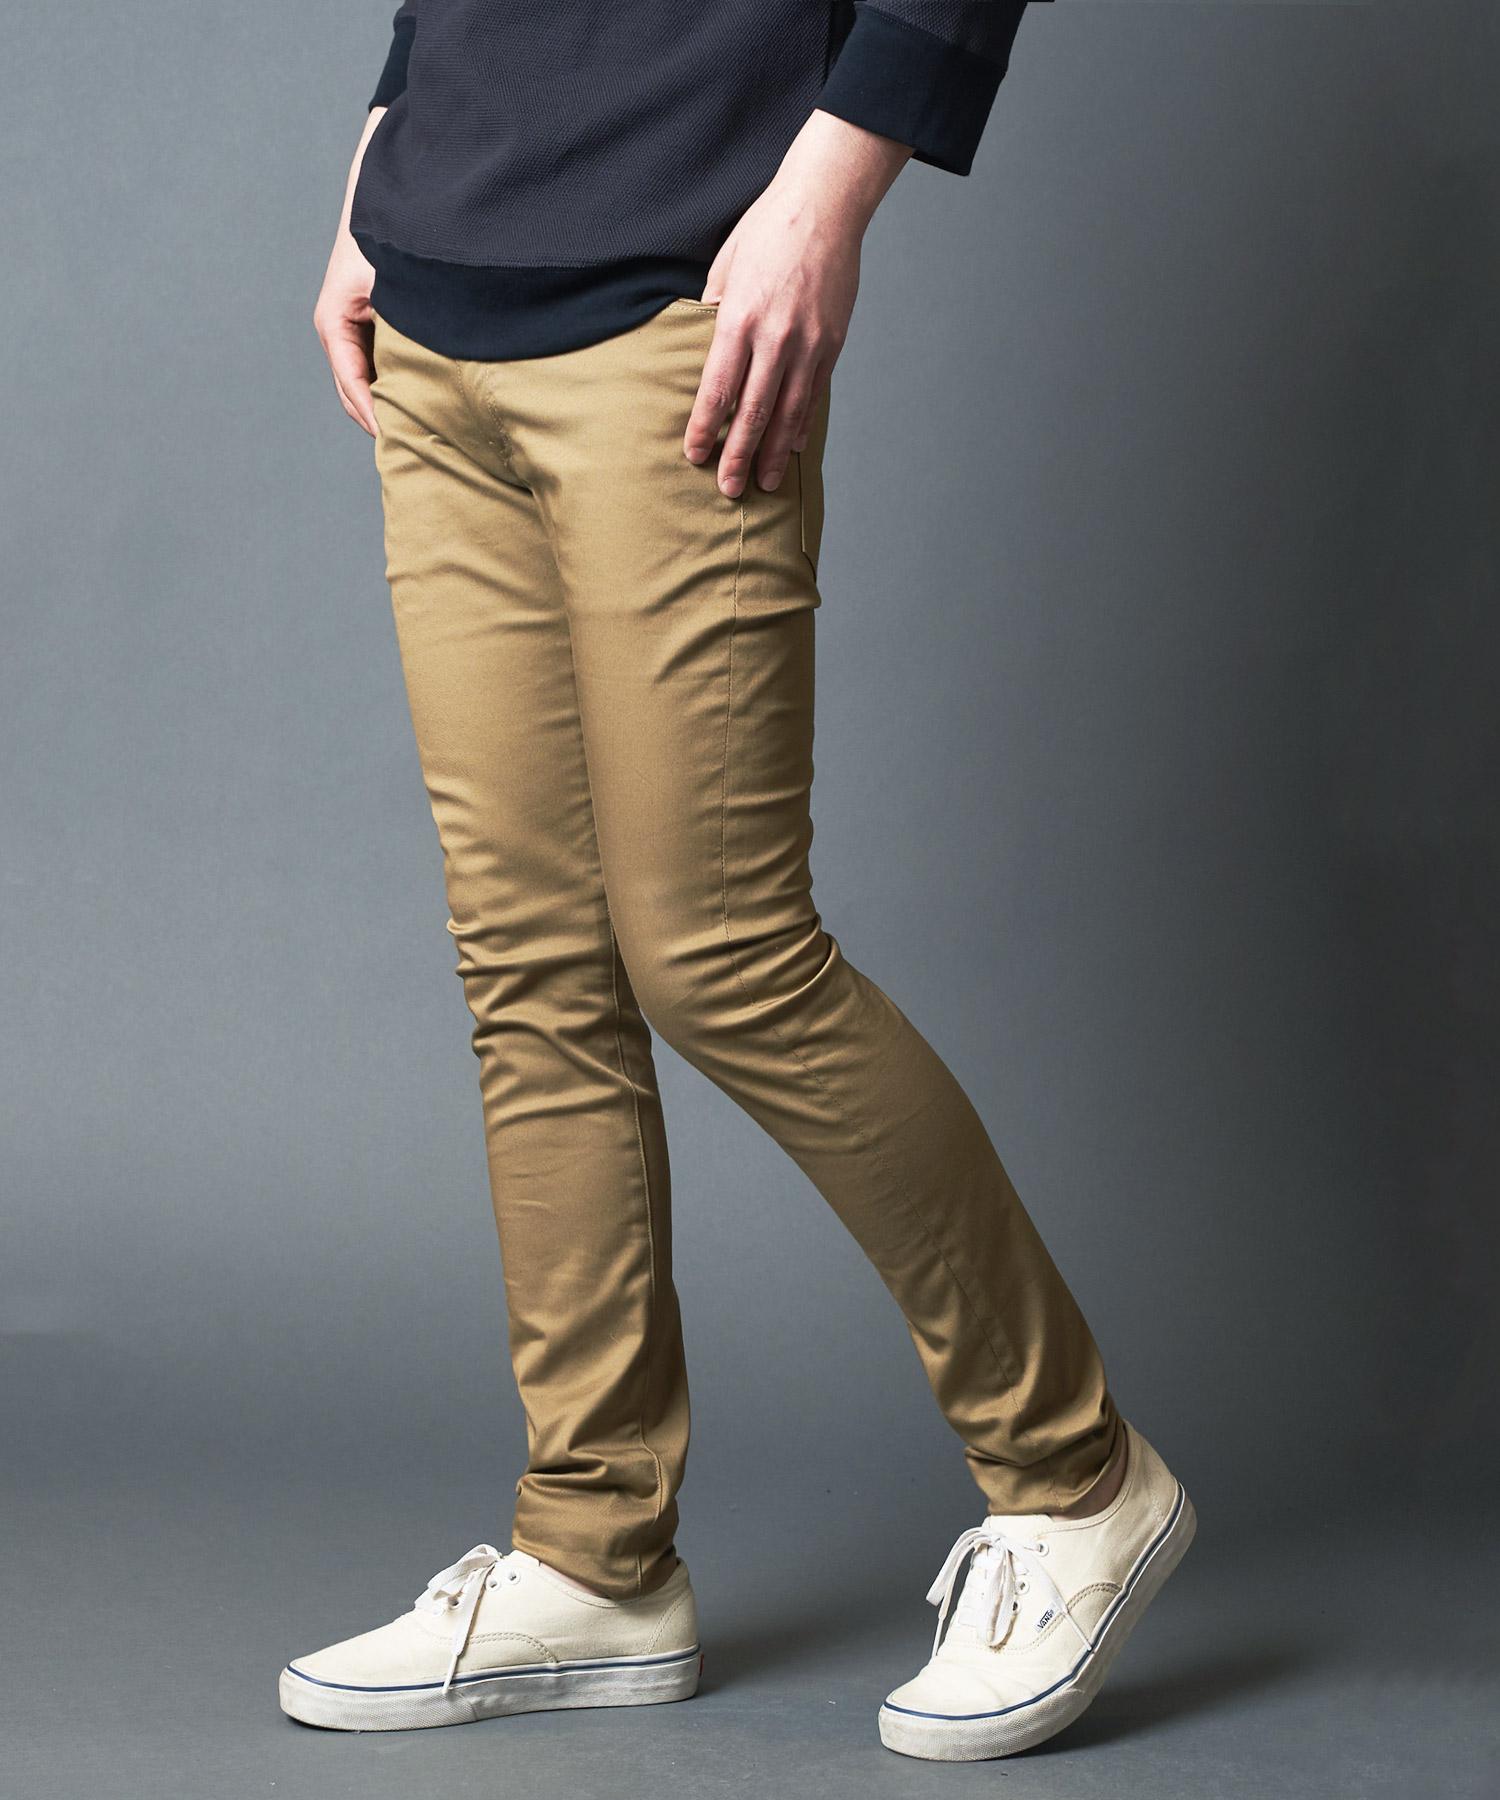 【Magine(マージン)】COMPACT CHINO ULTRA SKINNY 5PKT PANTS パンツ(2023-15)